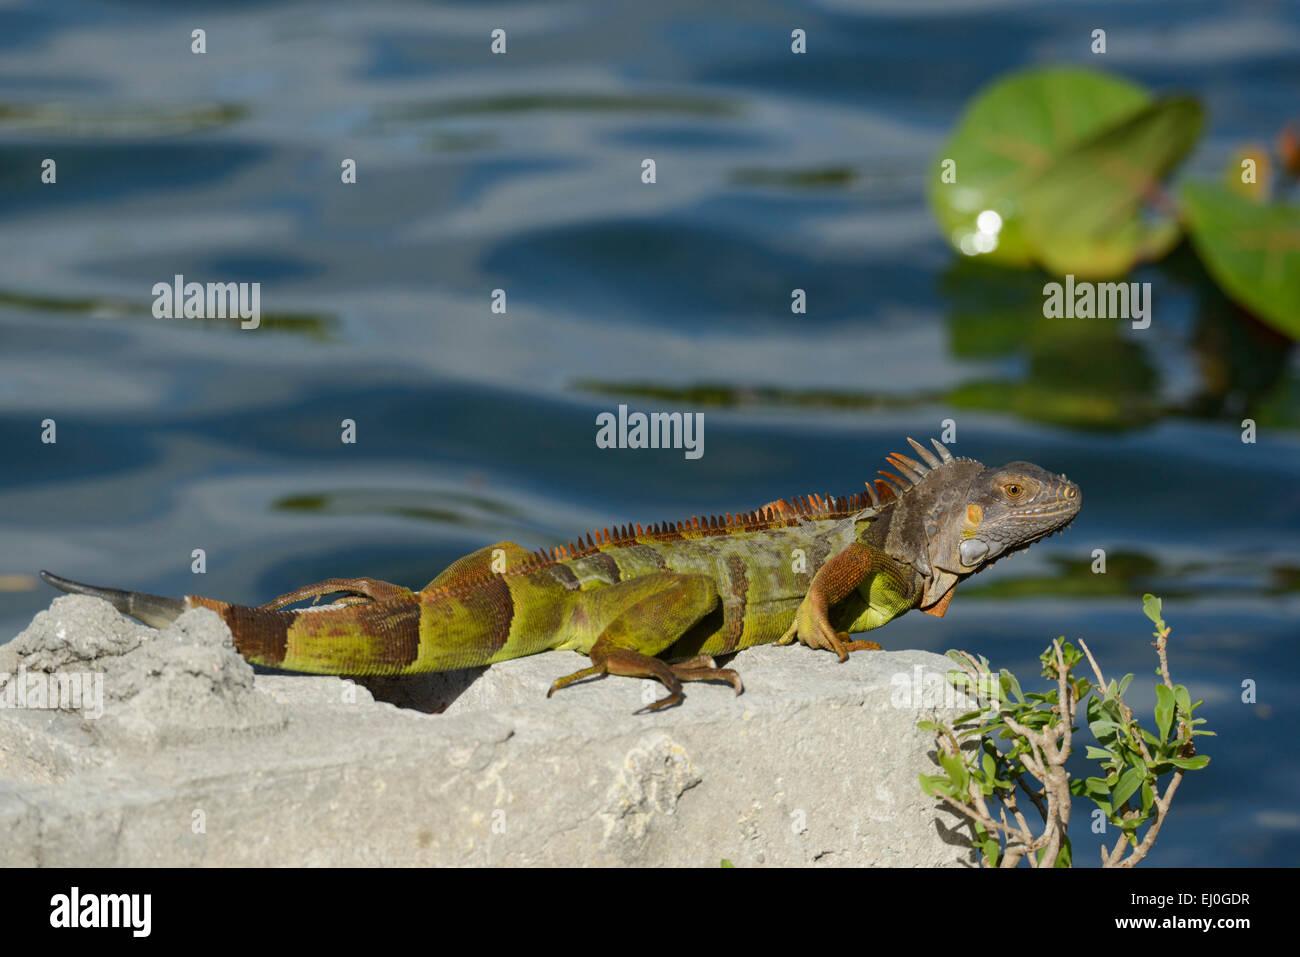 USA, Florida, Dade County, Miami Beach, Iguana - Stock Image